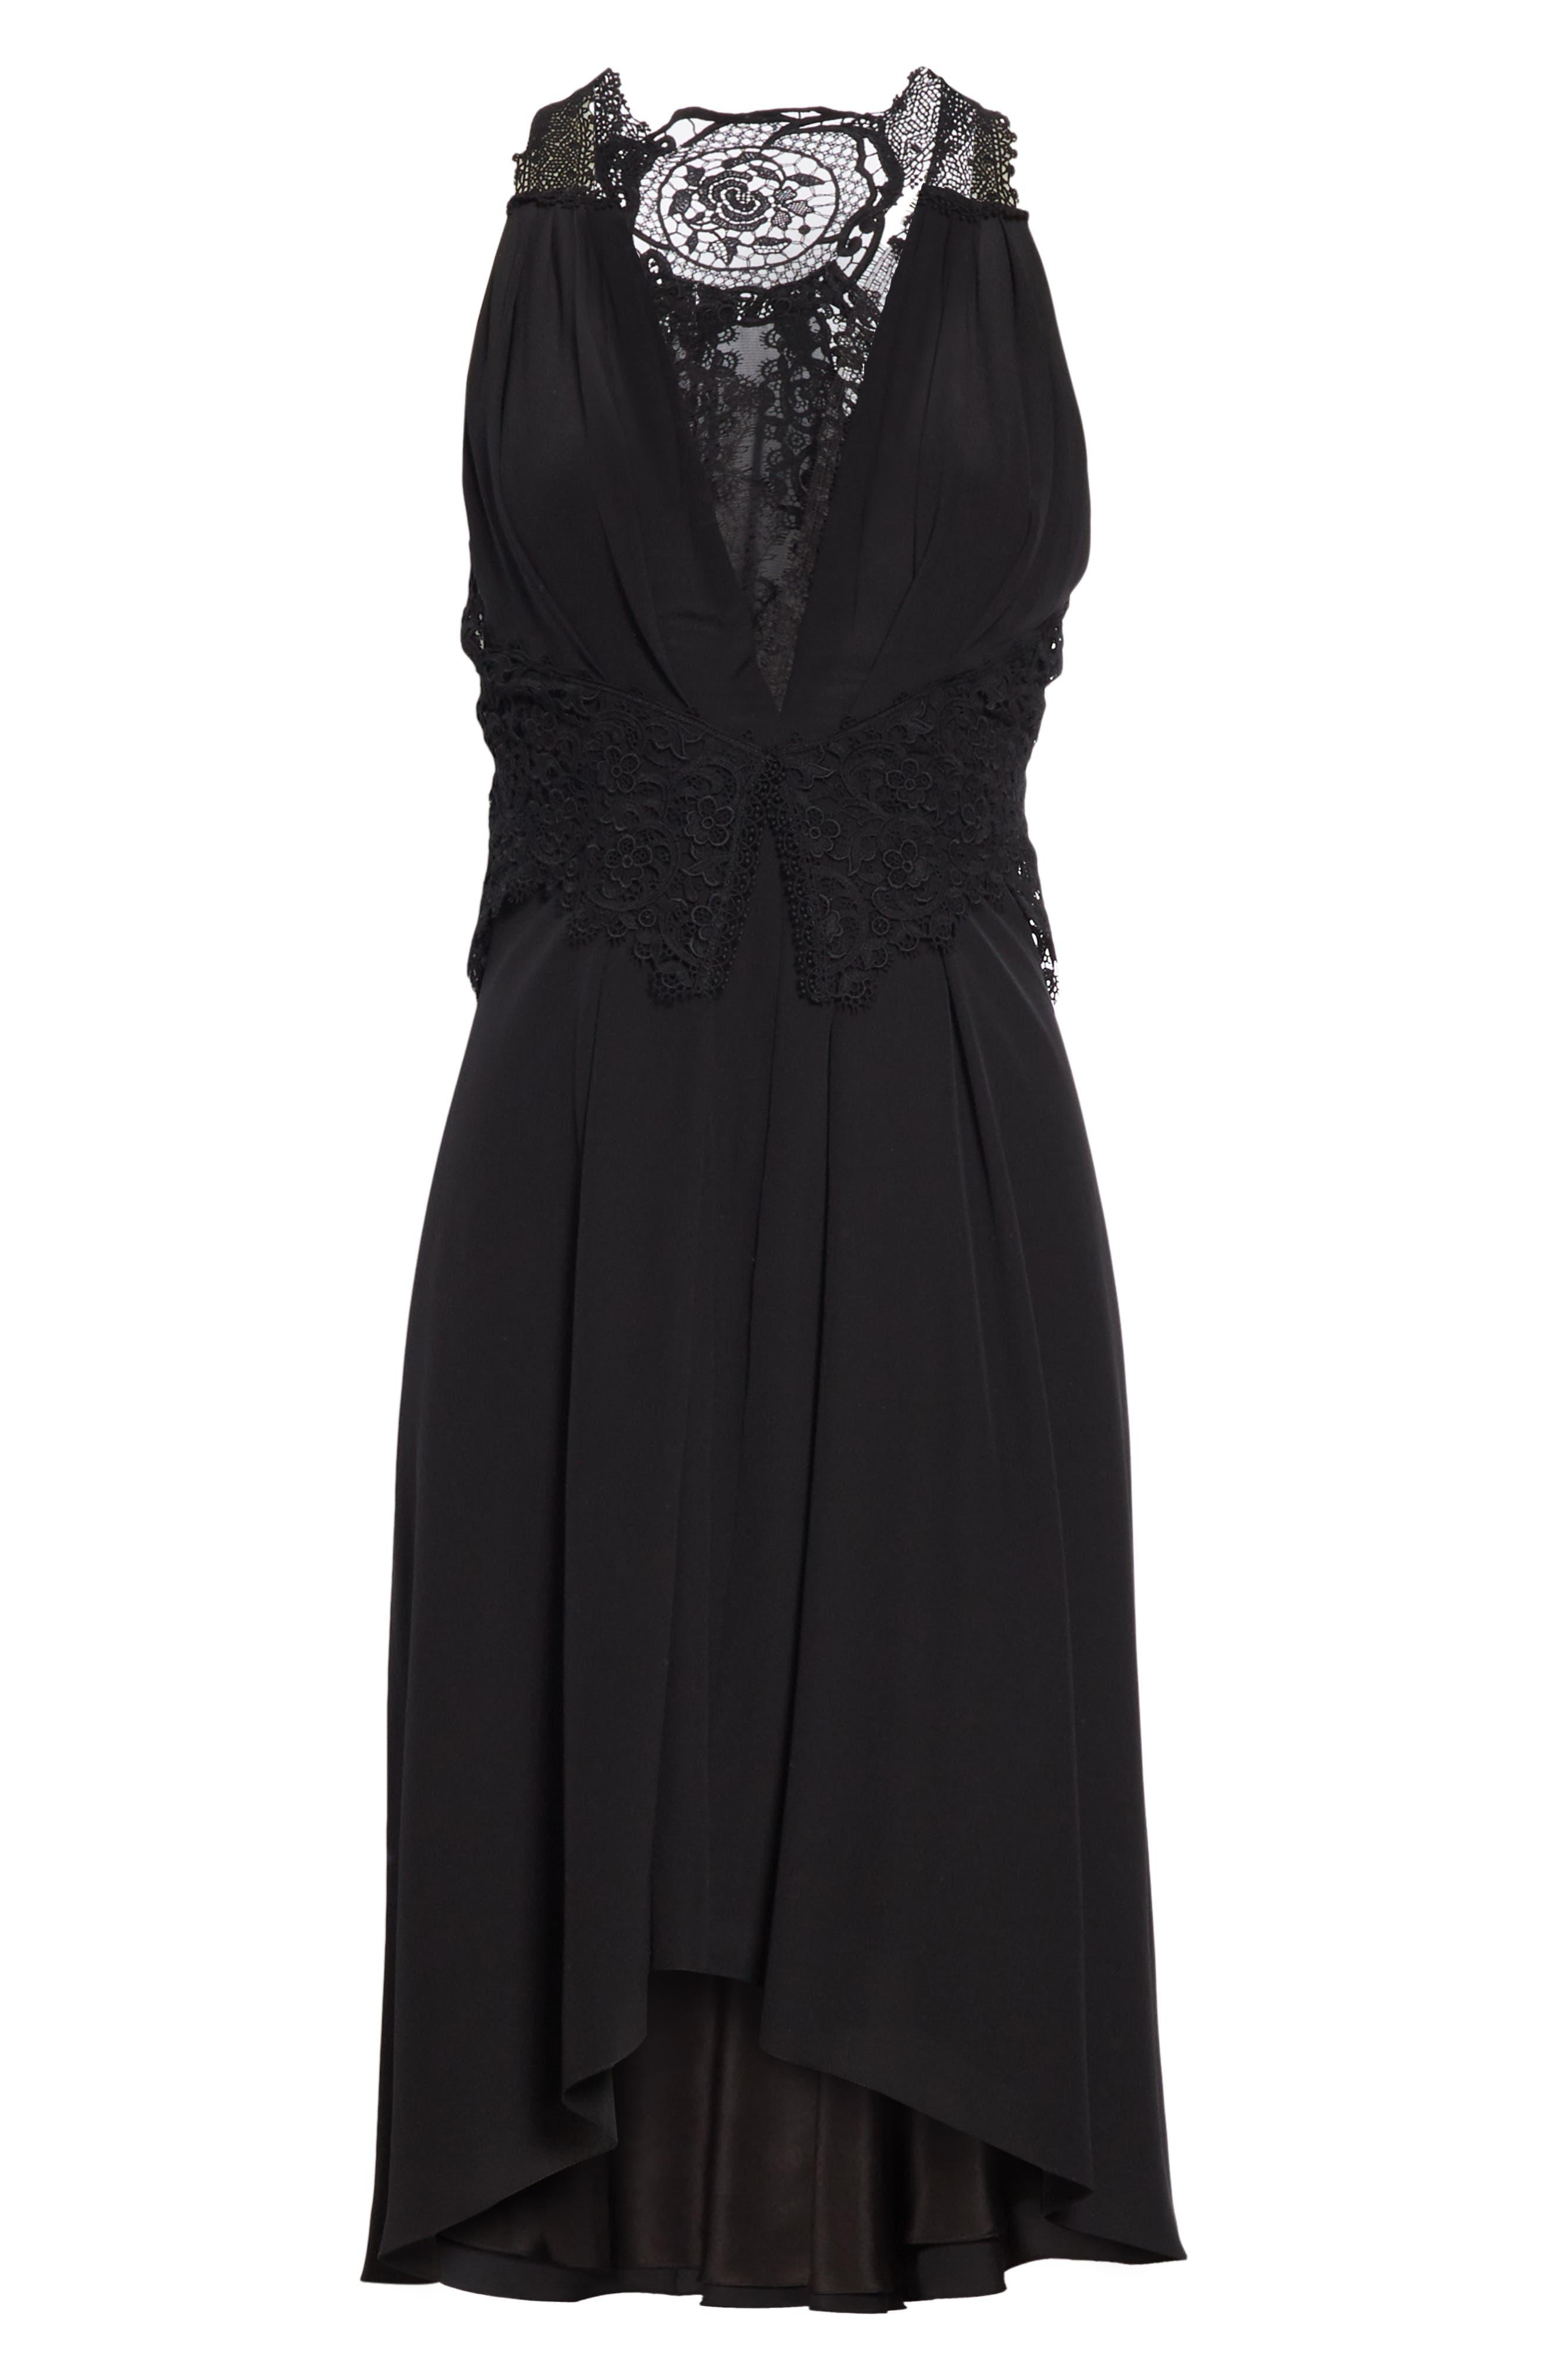 VICTORIA BECKHAM, Mixed Lace Trim High/Low Silk Dress, Alternate thumbnail 8, color, BLACK